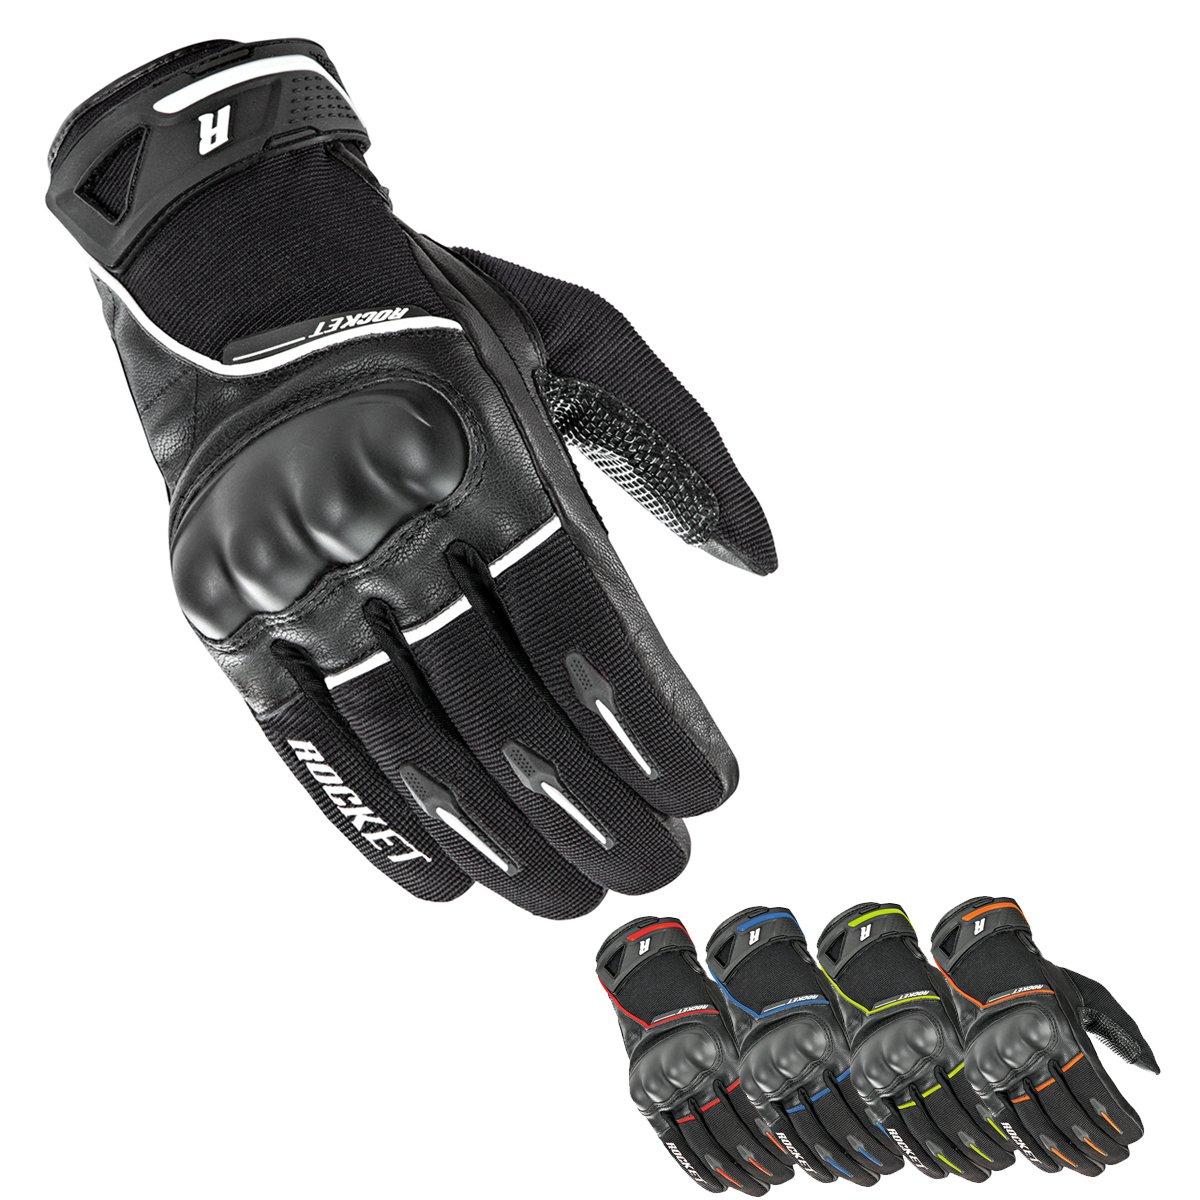 Joe Rocket Men's Super Moto Motorcycle Gloves (Black/Blue, Large)